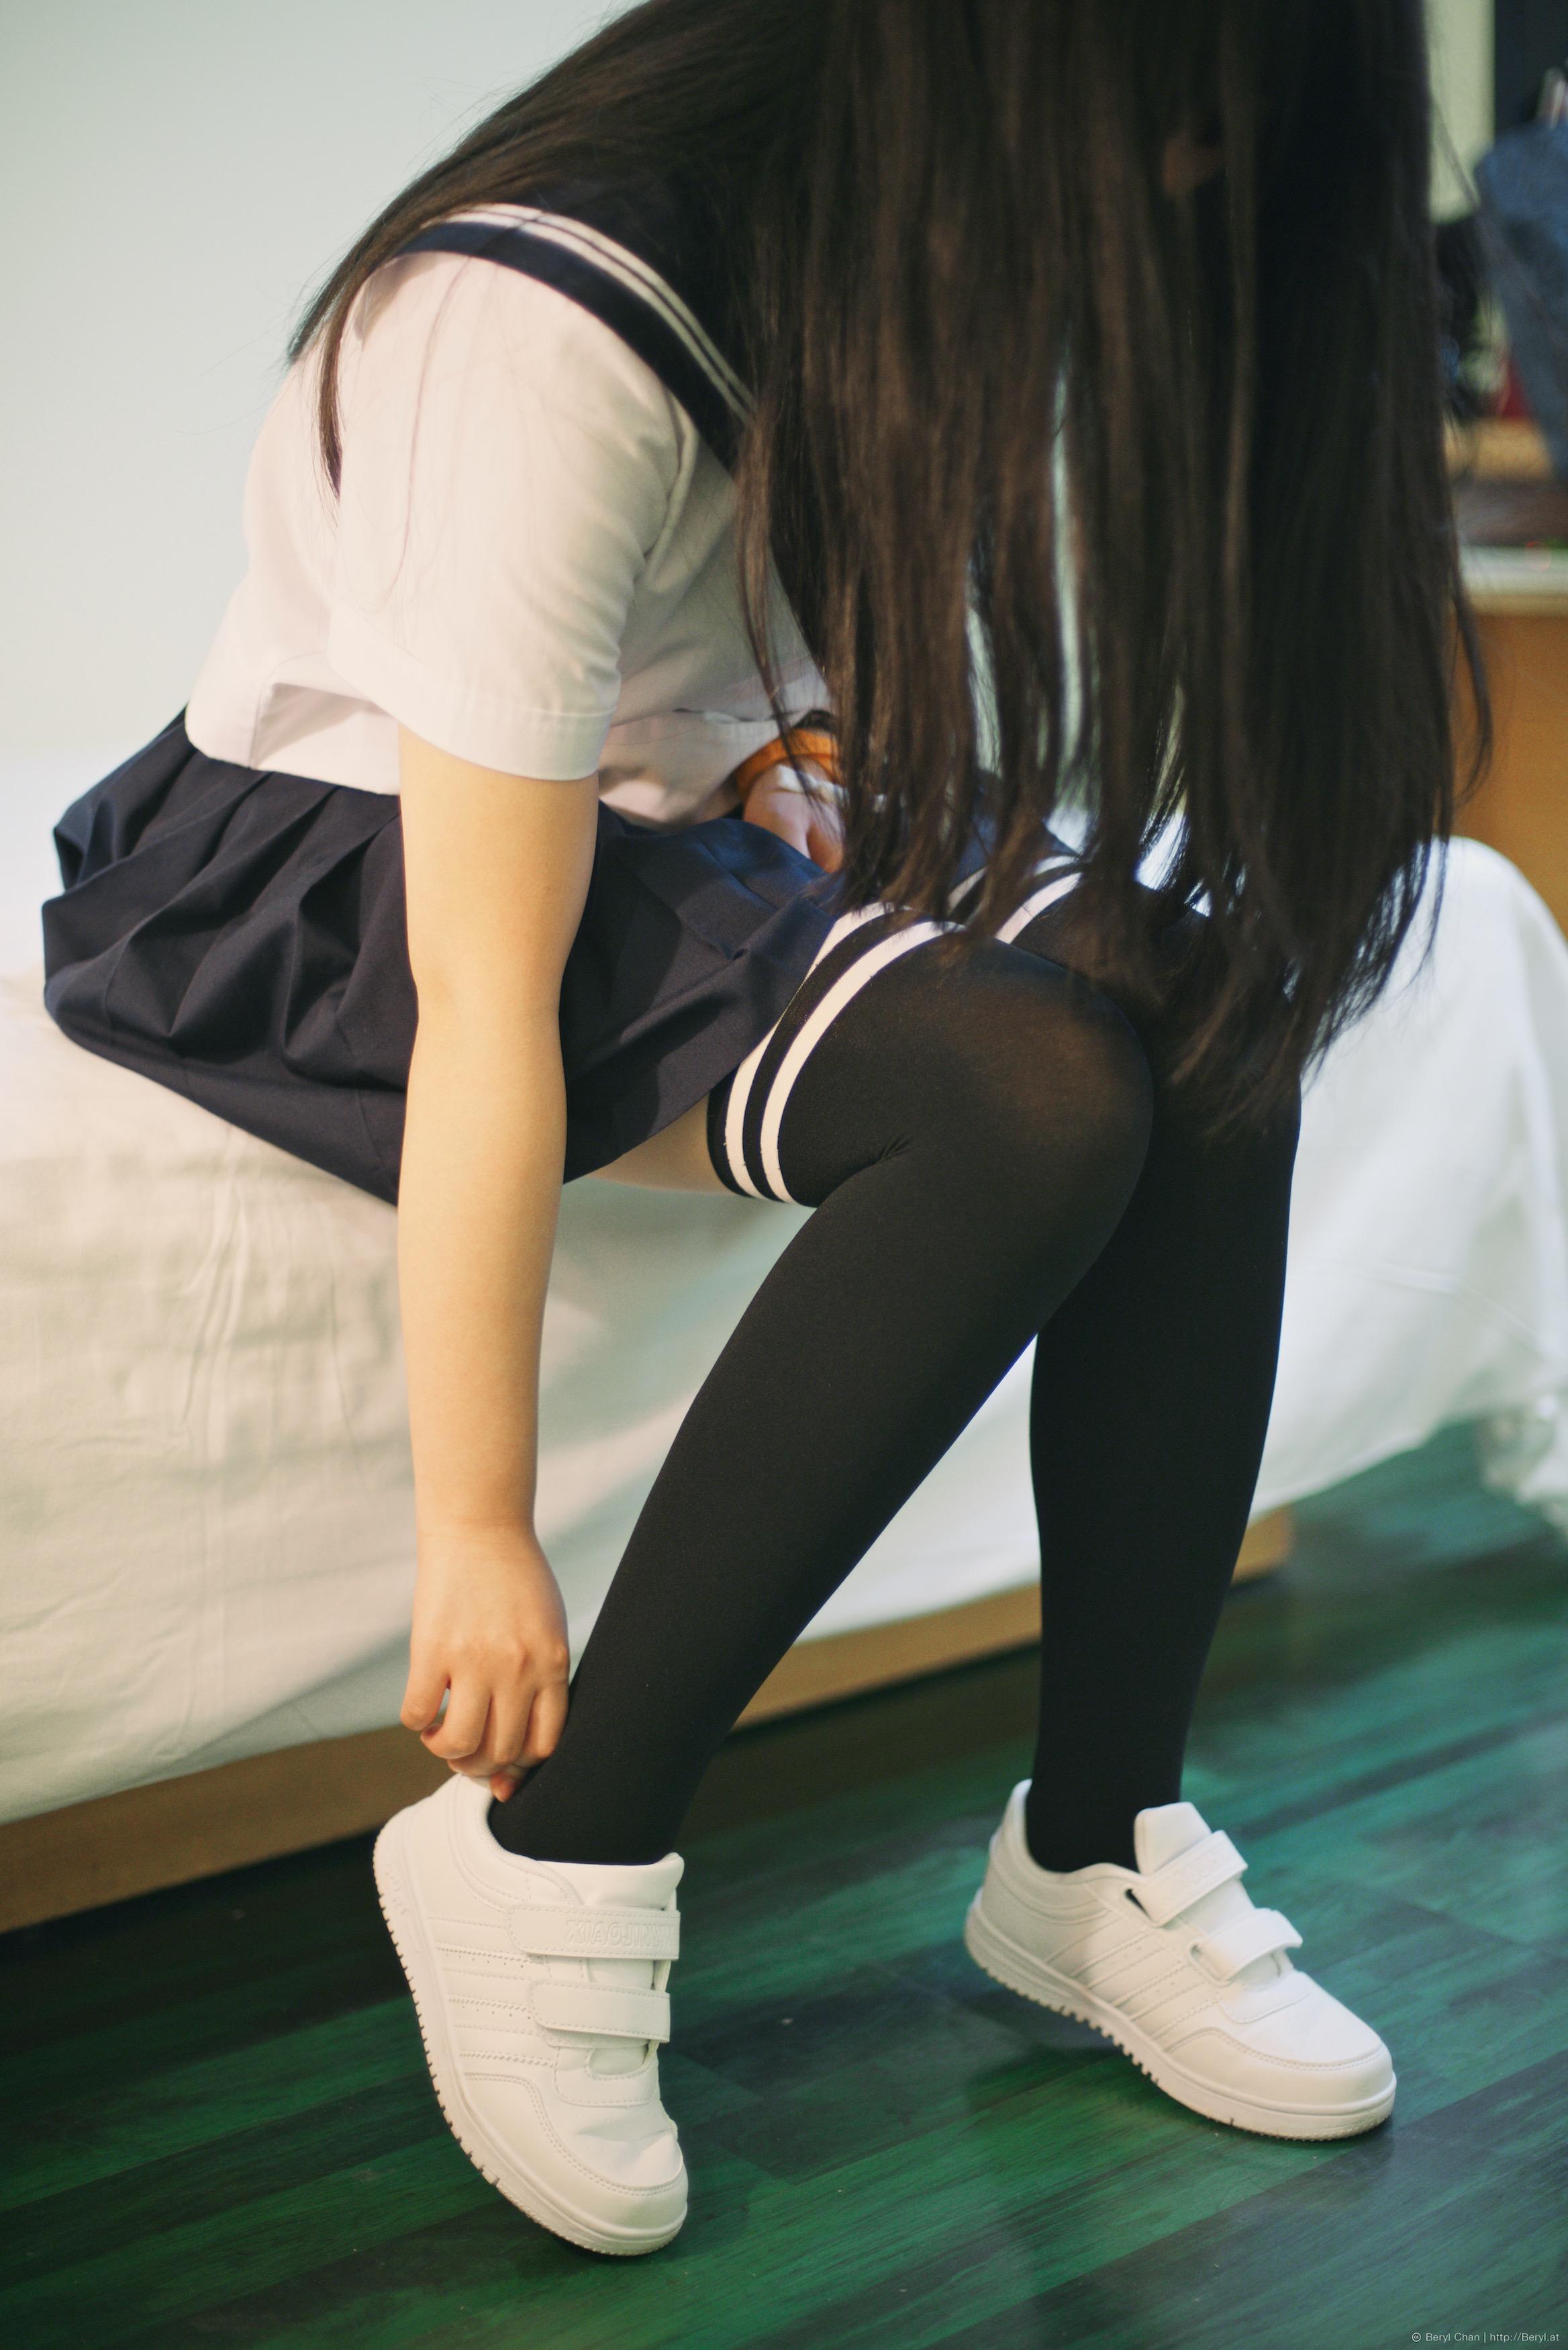 Free Images  Girl, Feet, Cute, Leg, Portrait, Foot, Indoor, Fashion, Nikon, Clothing -8649